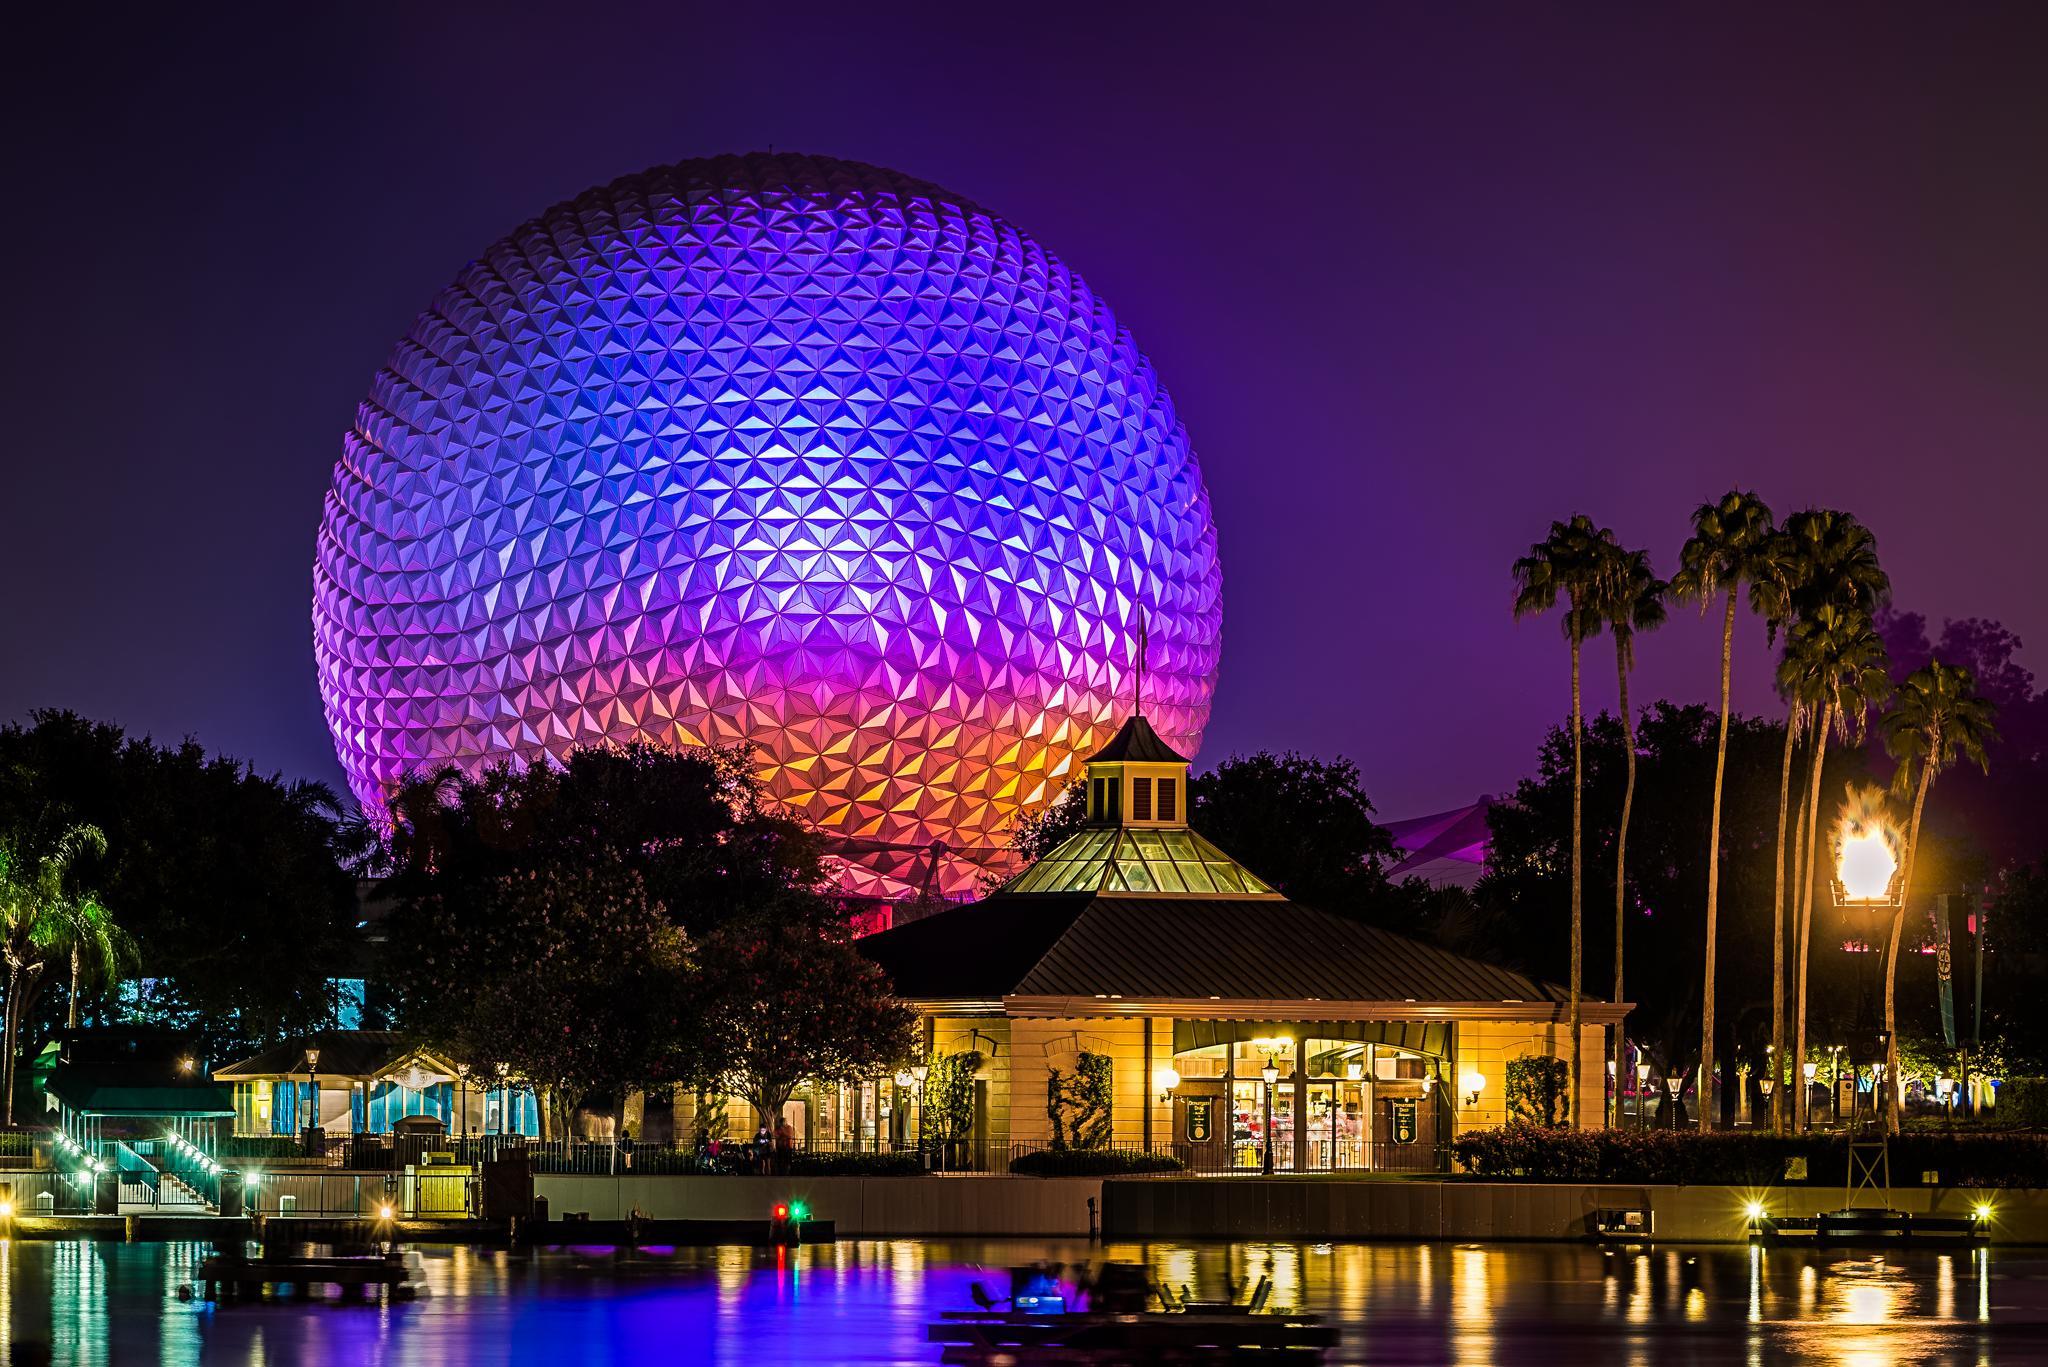 Epcot Disney disneyworld wdw waltdisneyworld epcotcenter spaceshipearth worldshowcase worldshowcaselagoon disneyparks